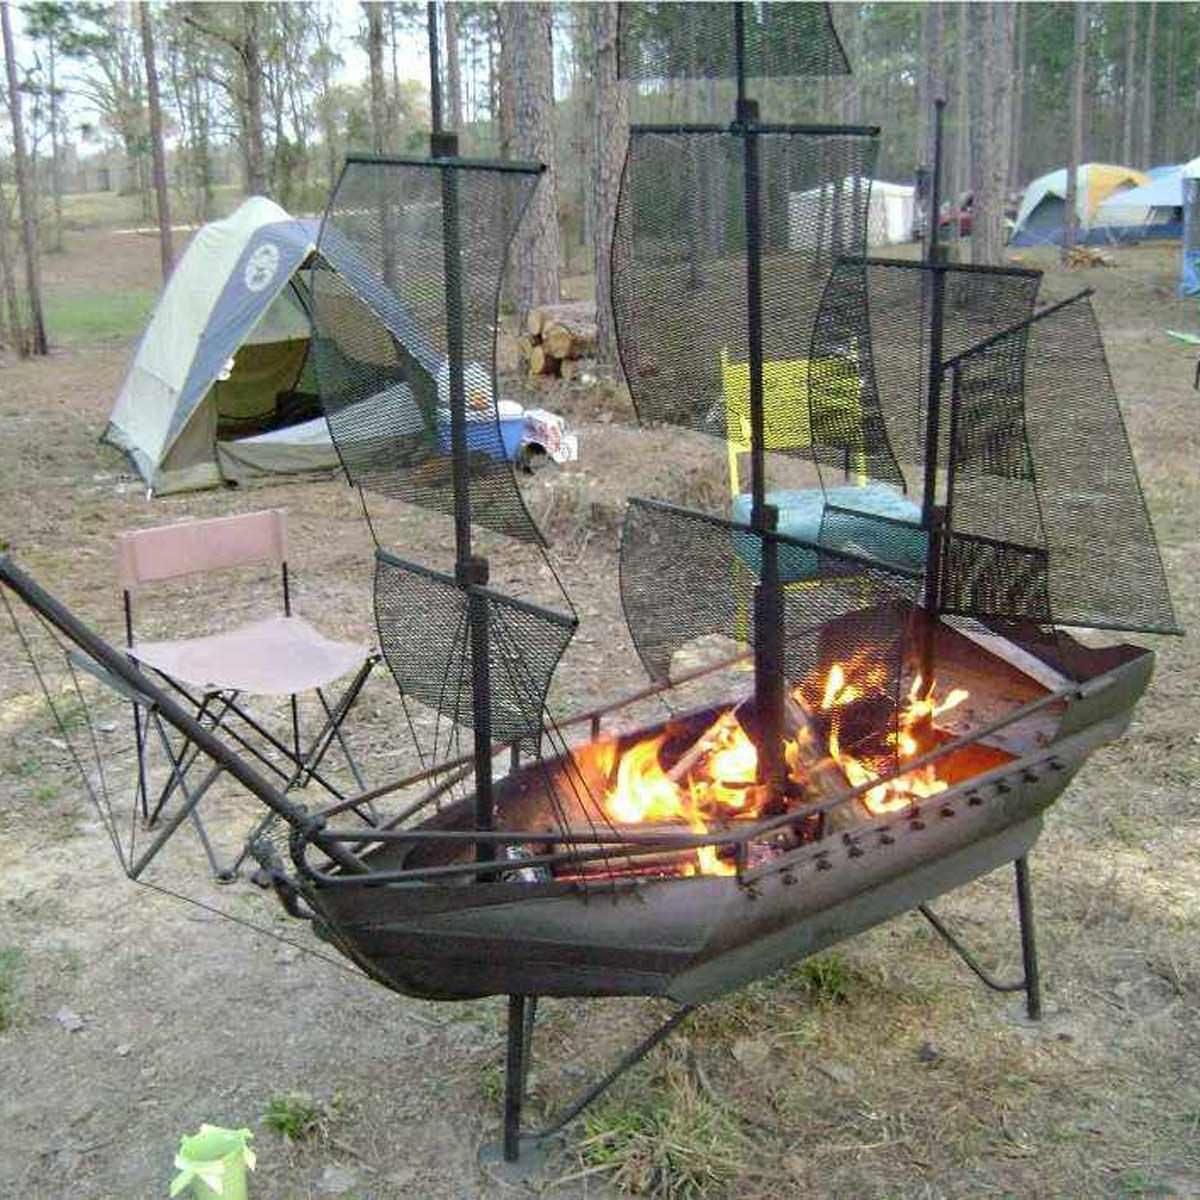 12 Great Backyard Fire Pit Ideas | The Family Handyman on Fire Pit Design  id=86298